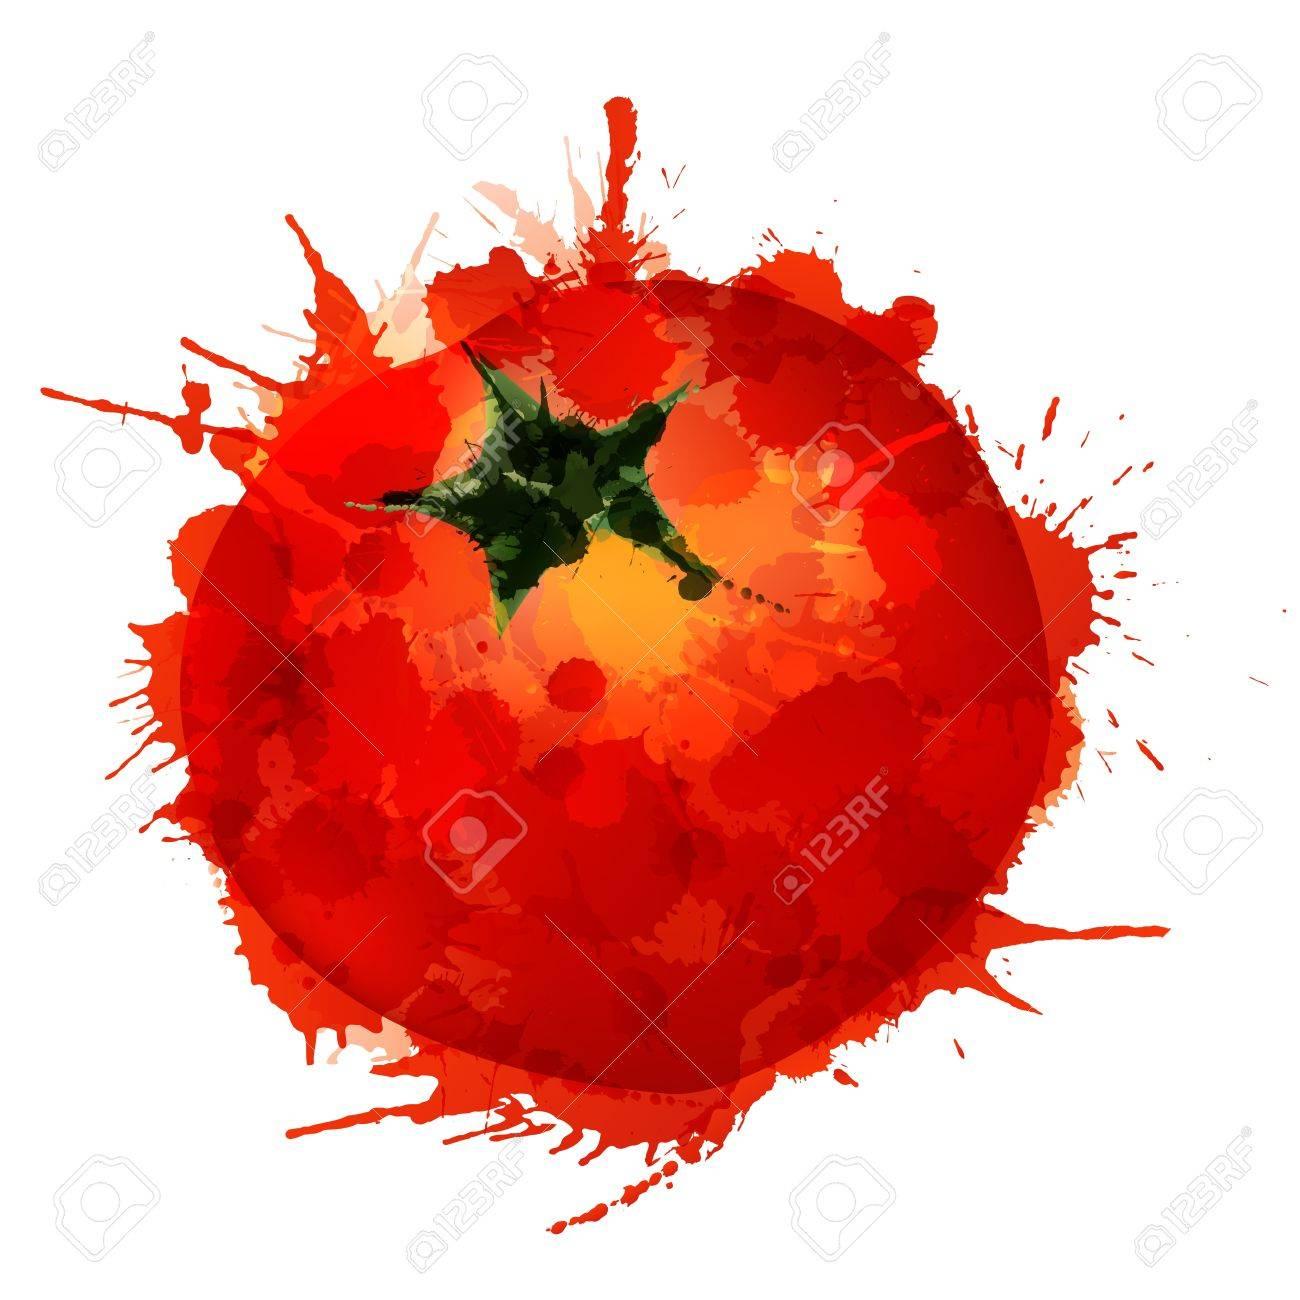 Tomato made of colorful splashes on white background - 21020279